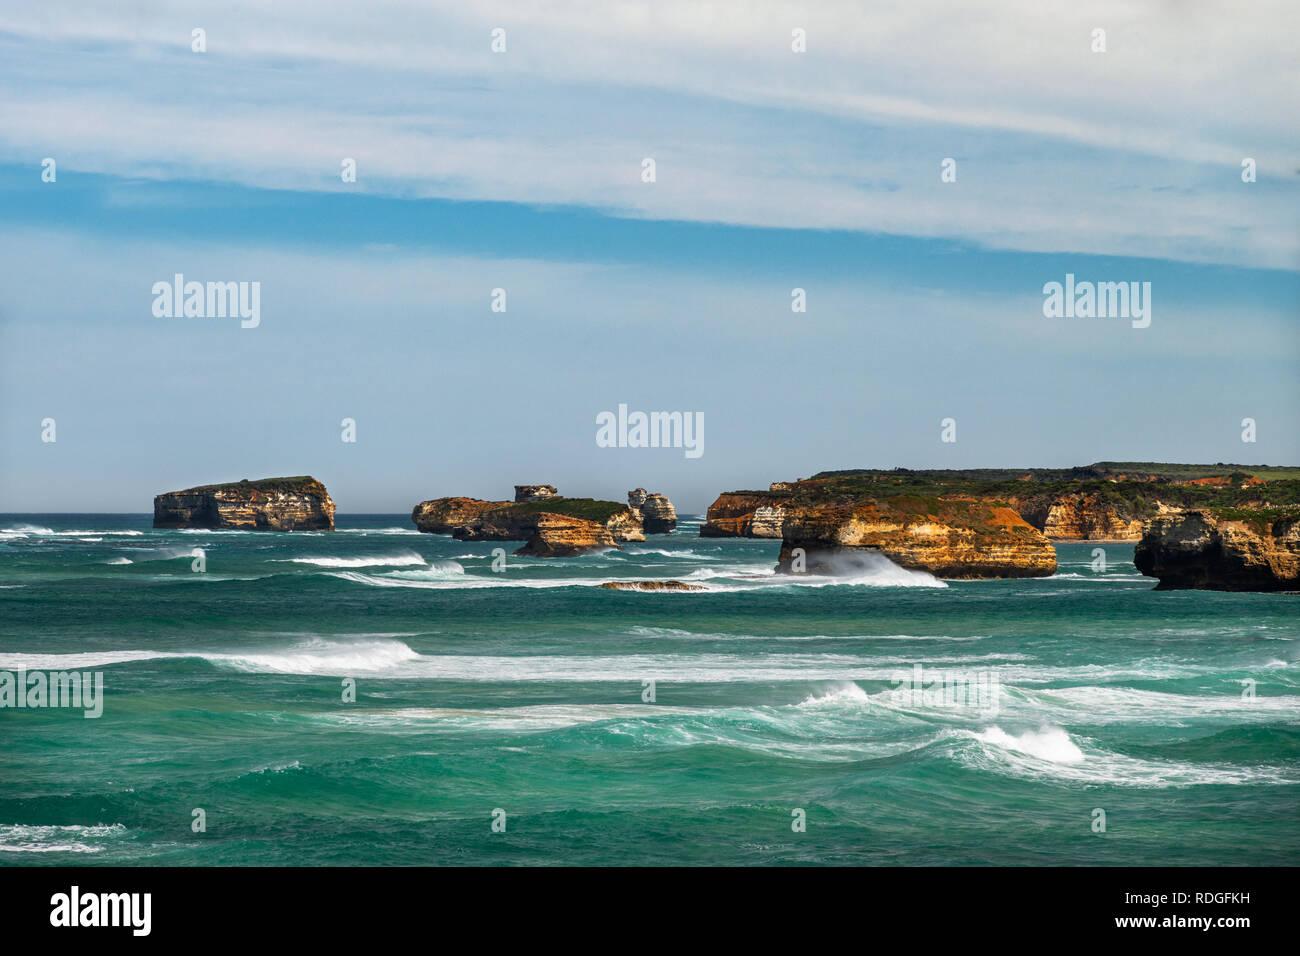 Many islands in Massacre Bay. - Stock Image